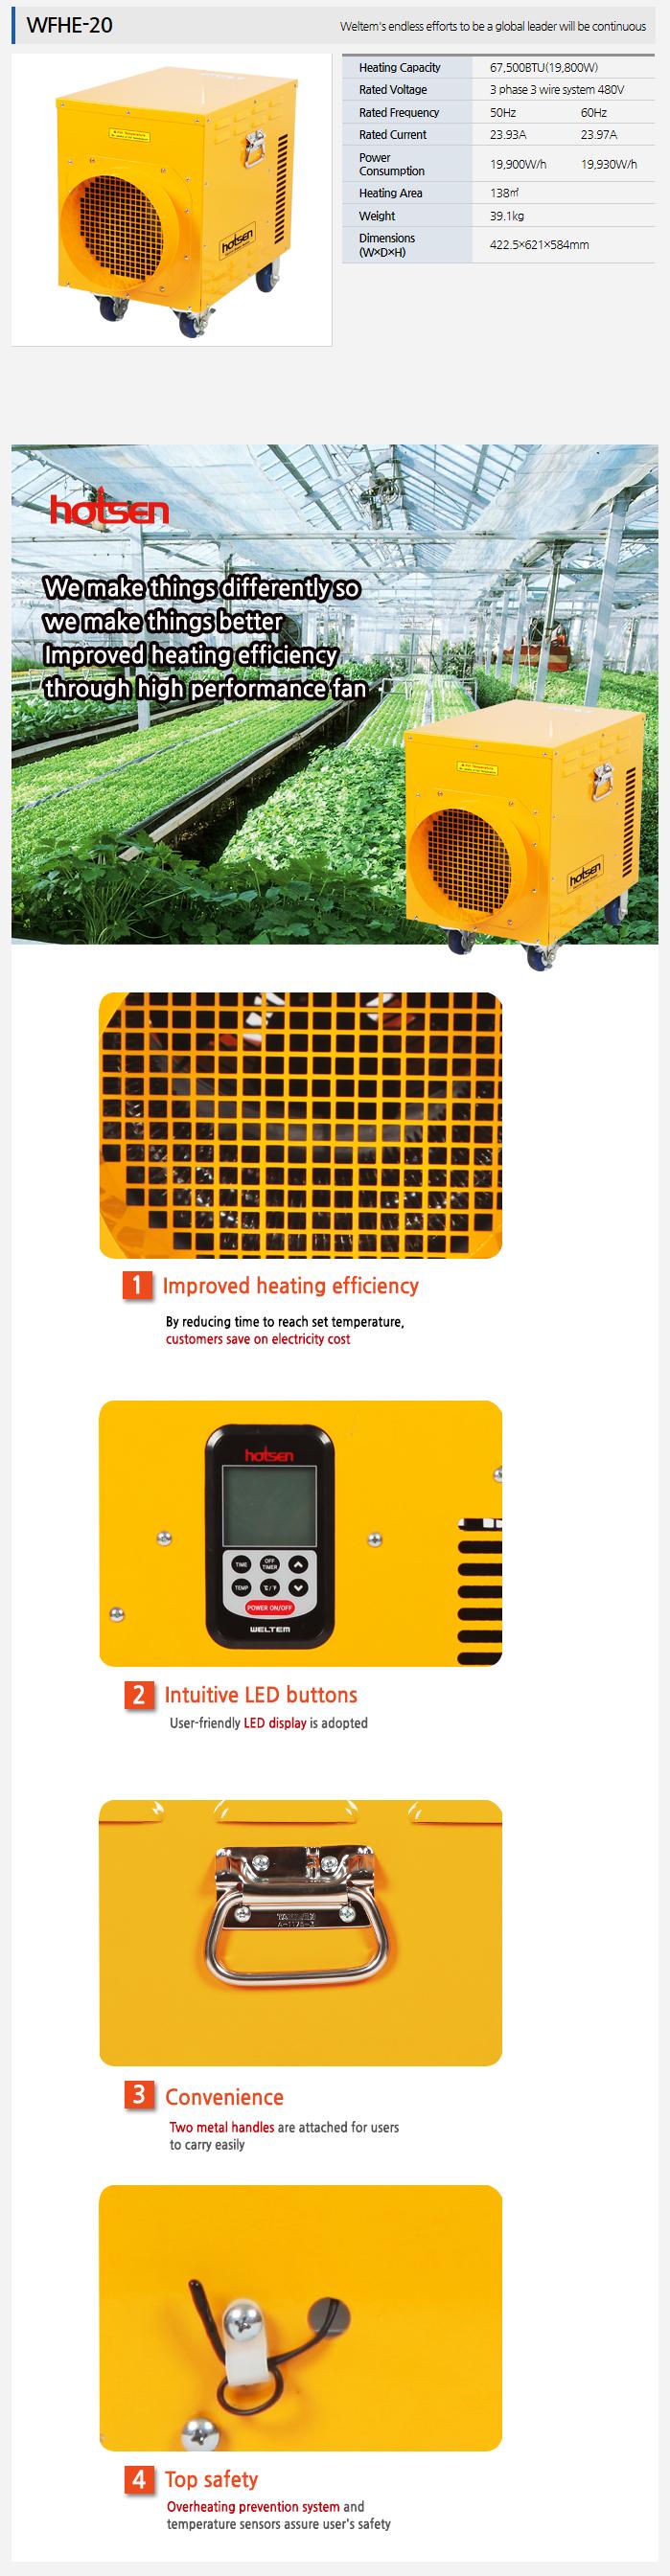 WELTEM Electric Blower Heater (480V) WFHE-20